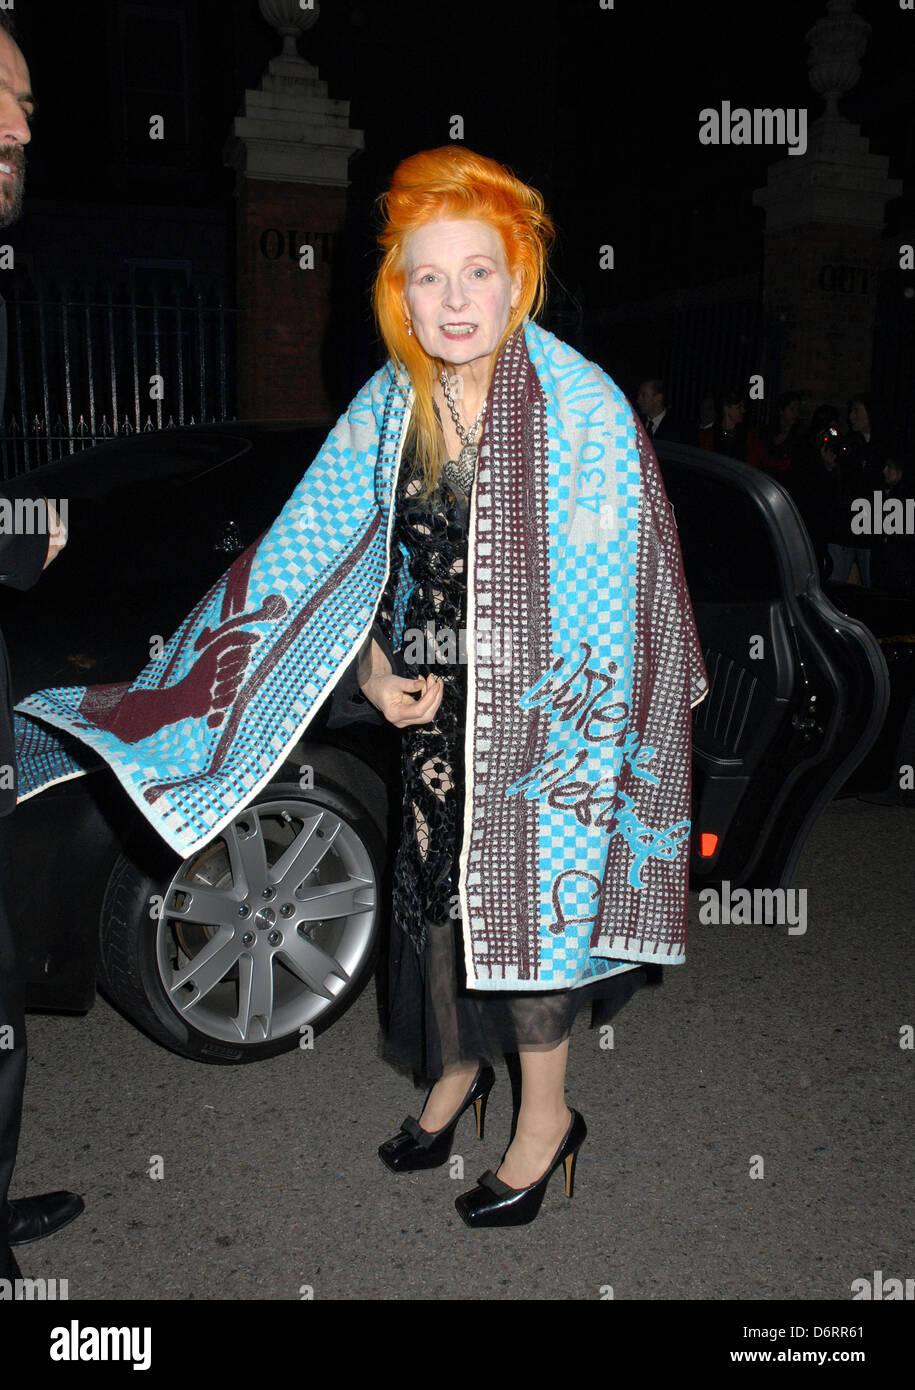 f80a3a5cc02 Dame Vivienne Westwood London Fashion Week A/W 2011: Get A Life Palladium -  Departures London, England - 18.02.11